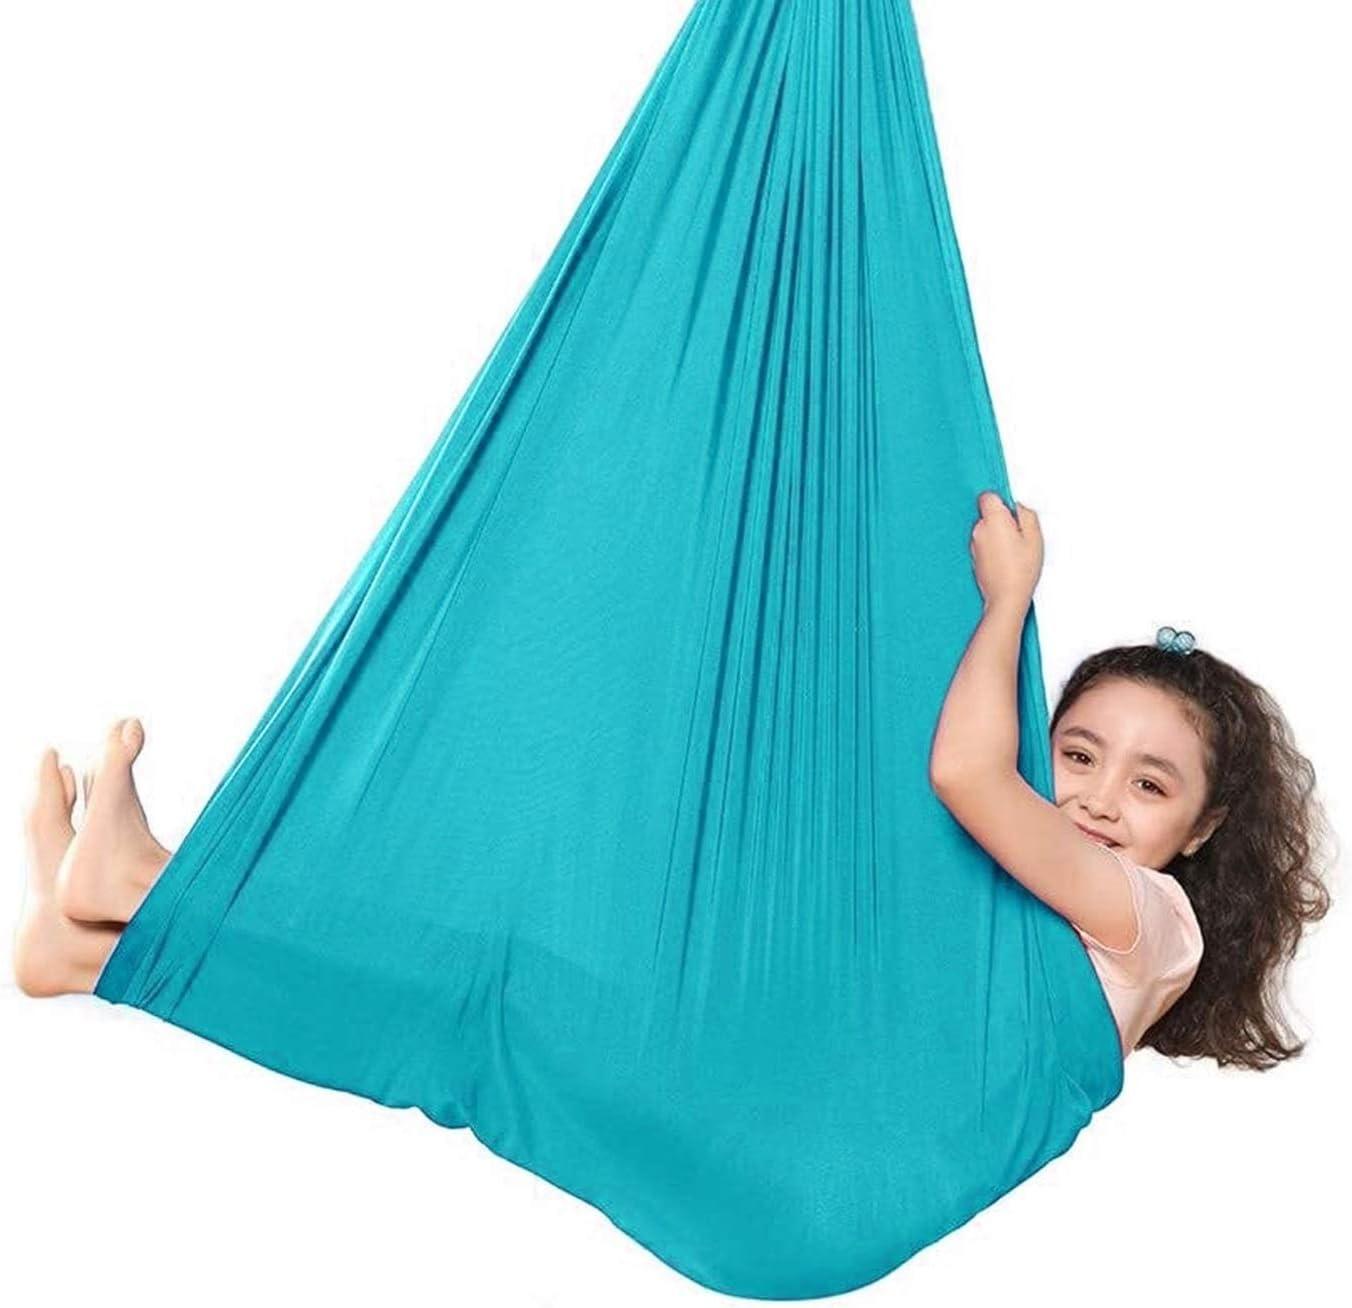 LSRRYD Cuddle Hammock for Children Special San Diego Mall Portland Mall N with